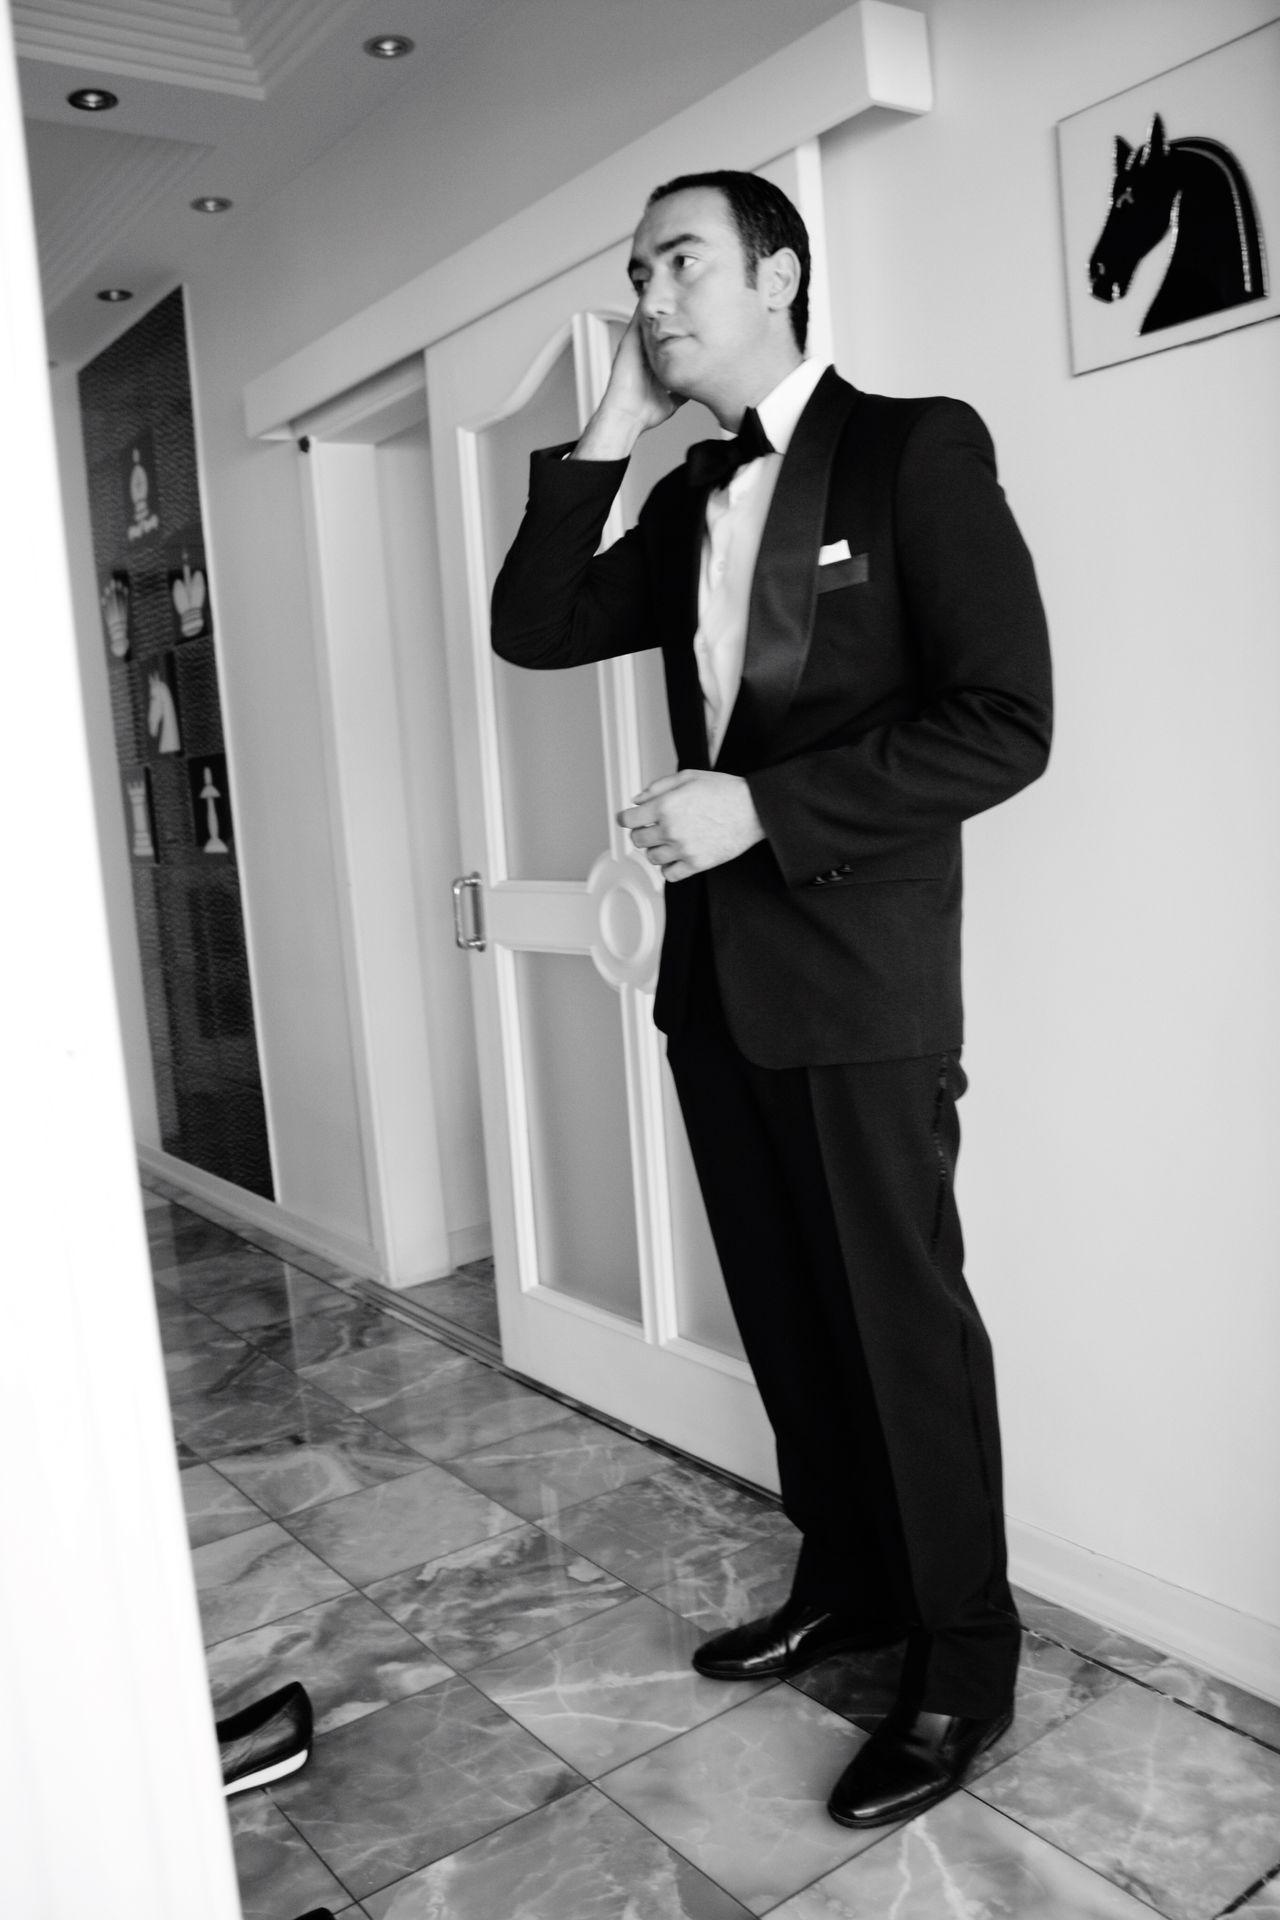 Blackandwhite Saturday Monochrome Eye4photography  Eyeemphotography Selfportrait Tuxedo Eye4black&white  Wedding Check This Out Hi! Enjoying Life Memories TBT  Love People EyeEm